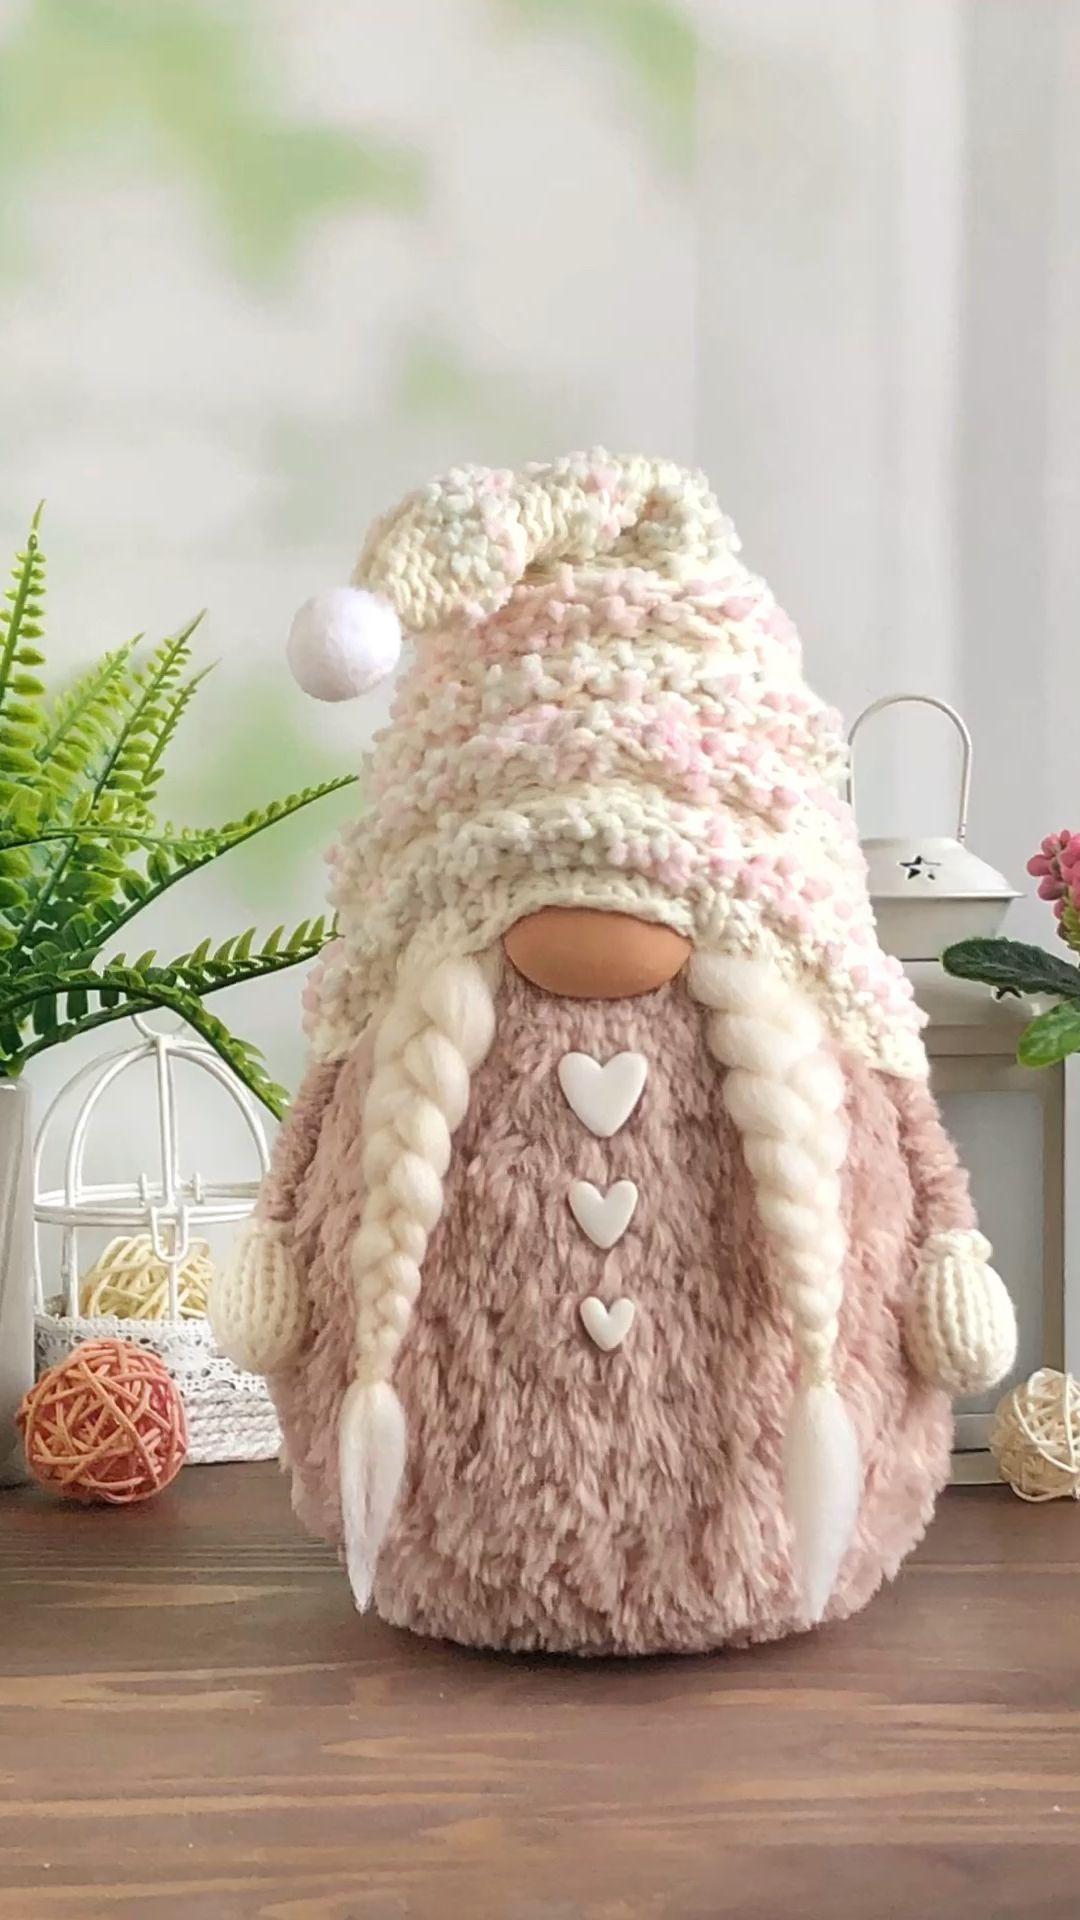 Pink Stuffed Gnome with heart, Summer gnome decor, Home gnome decor